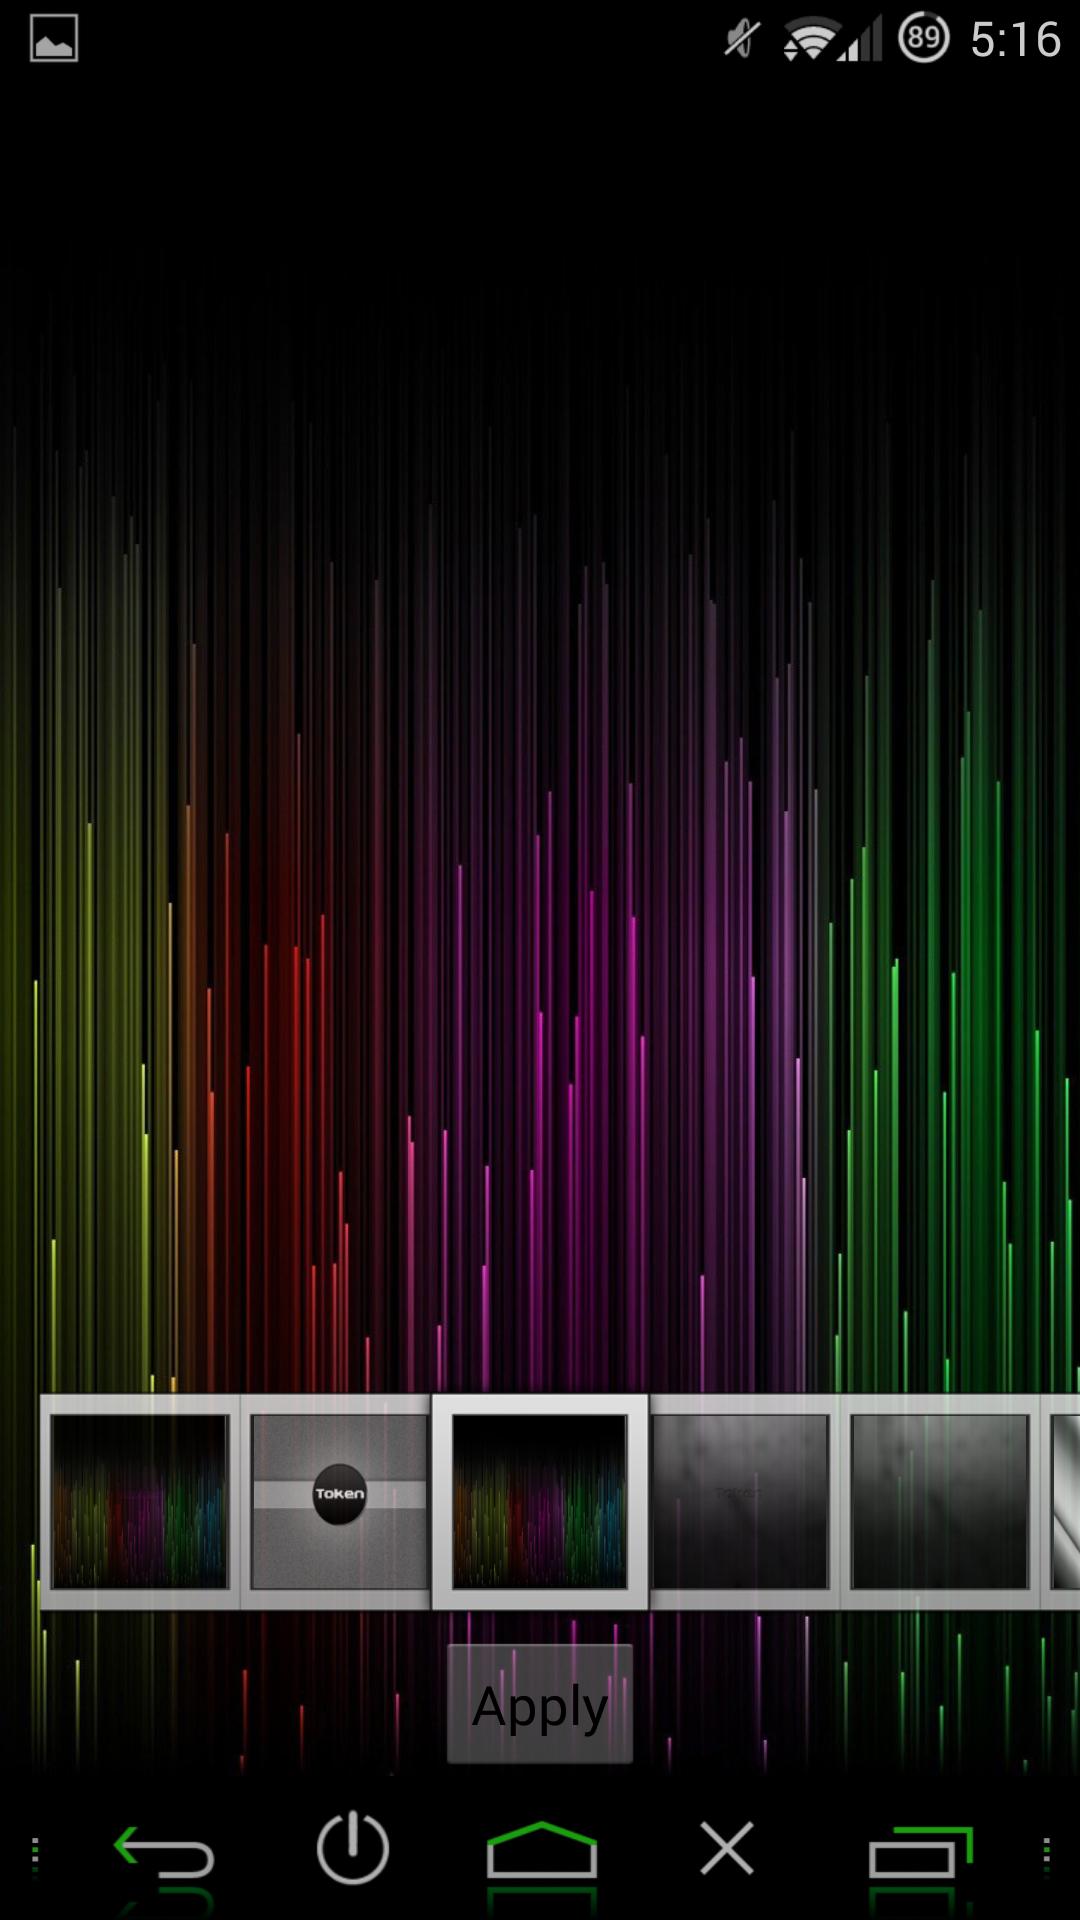 Paranoid Android 46 beta 3